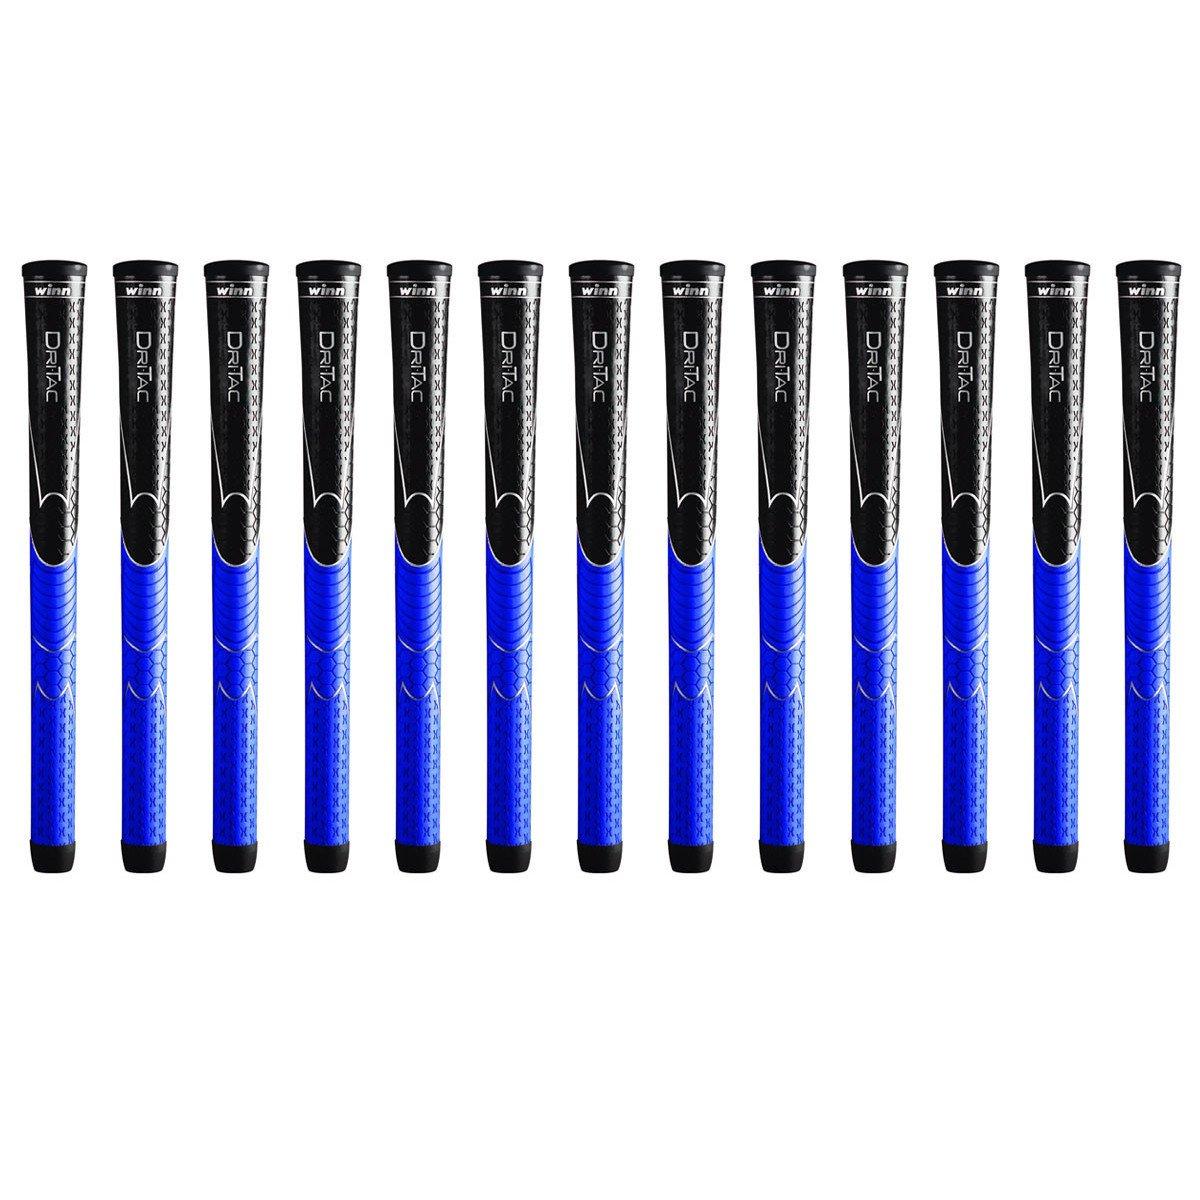 Winn dri-tac Midsize (+ 1 / 16インチ) ブラック/ブルー13 Pieceゴルフグリップバンドル( B01C7HQFQ6